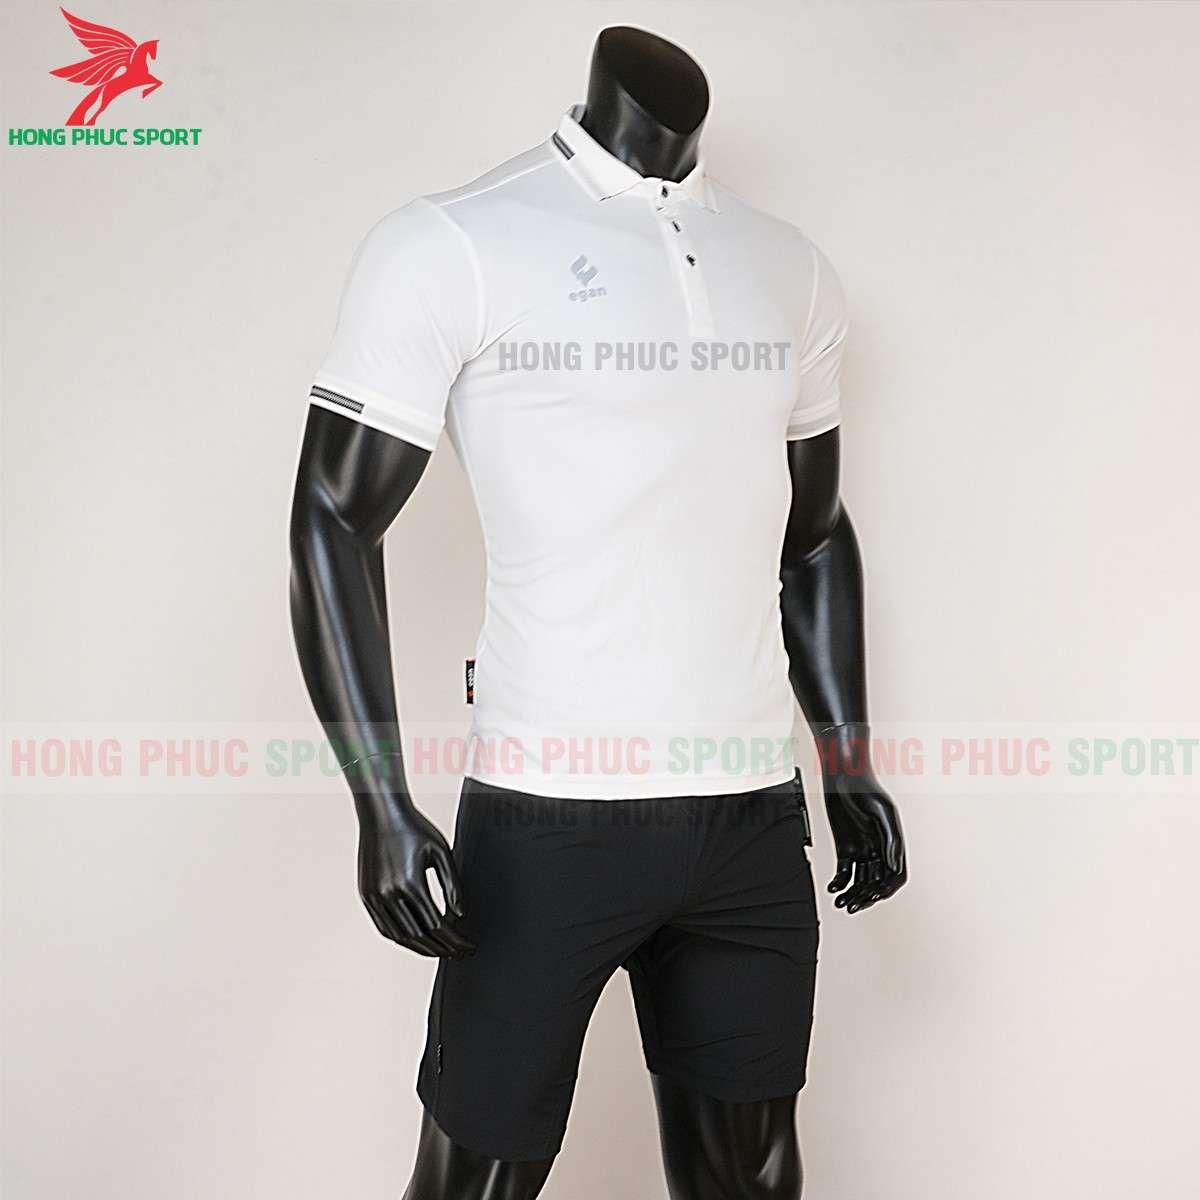 https://cdn.hongphucsport.com/unsafe/cdn.hongphucsport.com/dothethao.net.vn/wp-content/uploads/2020/02/ao-di-chuyen-bong-da-polo-uv-egan-trang-2.jpg